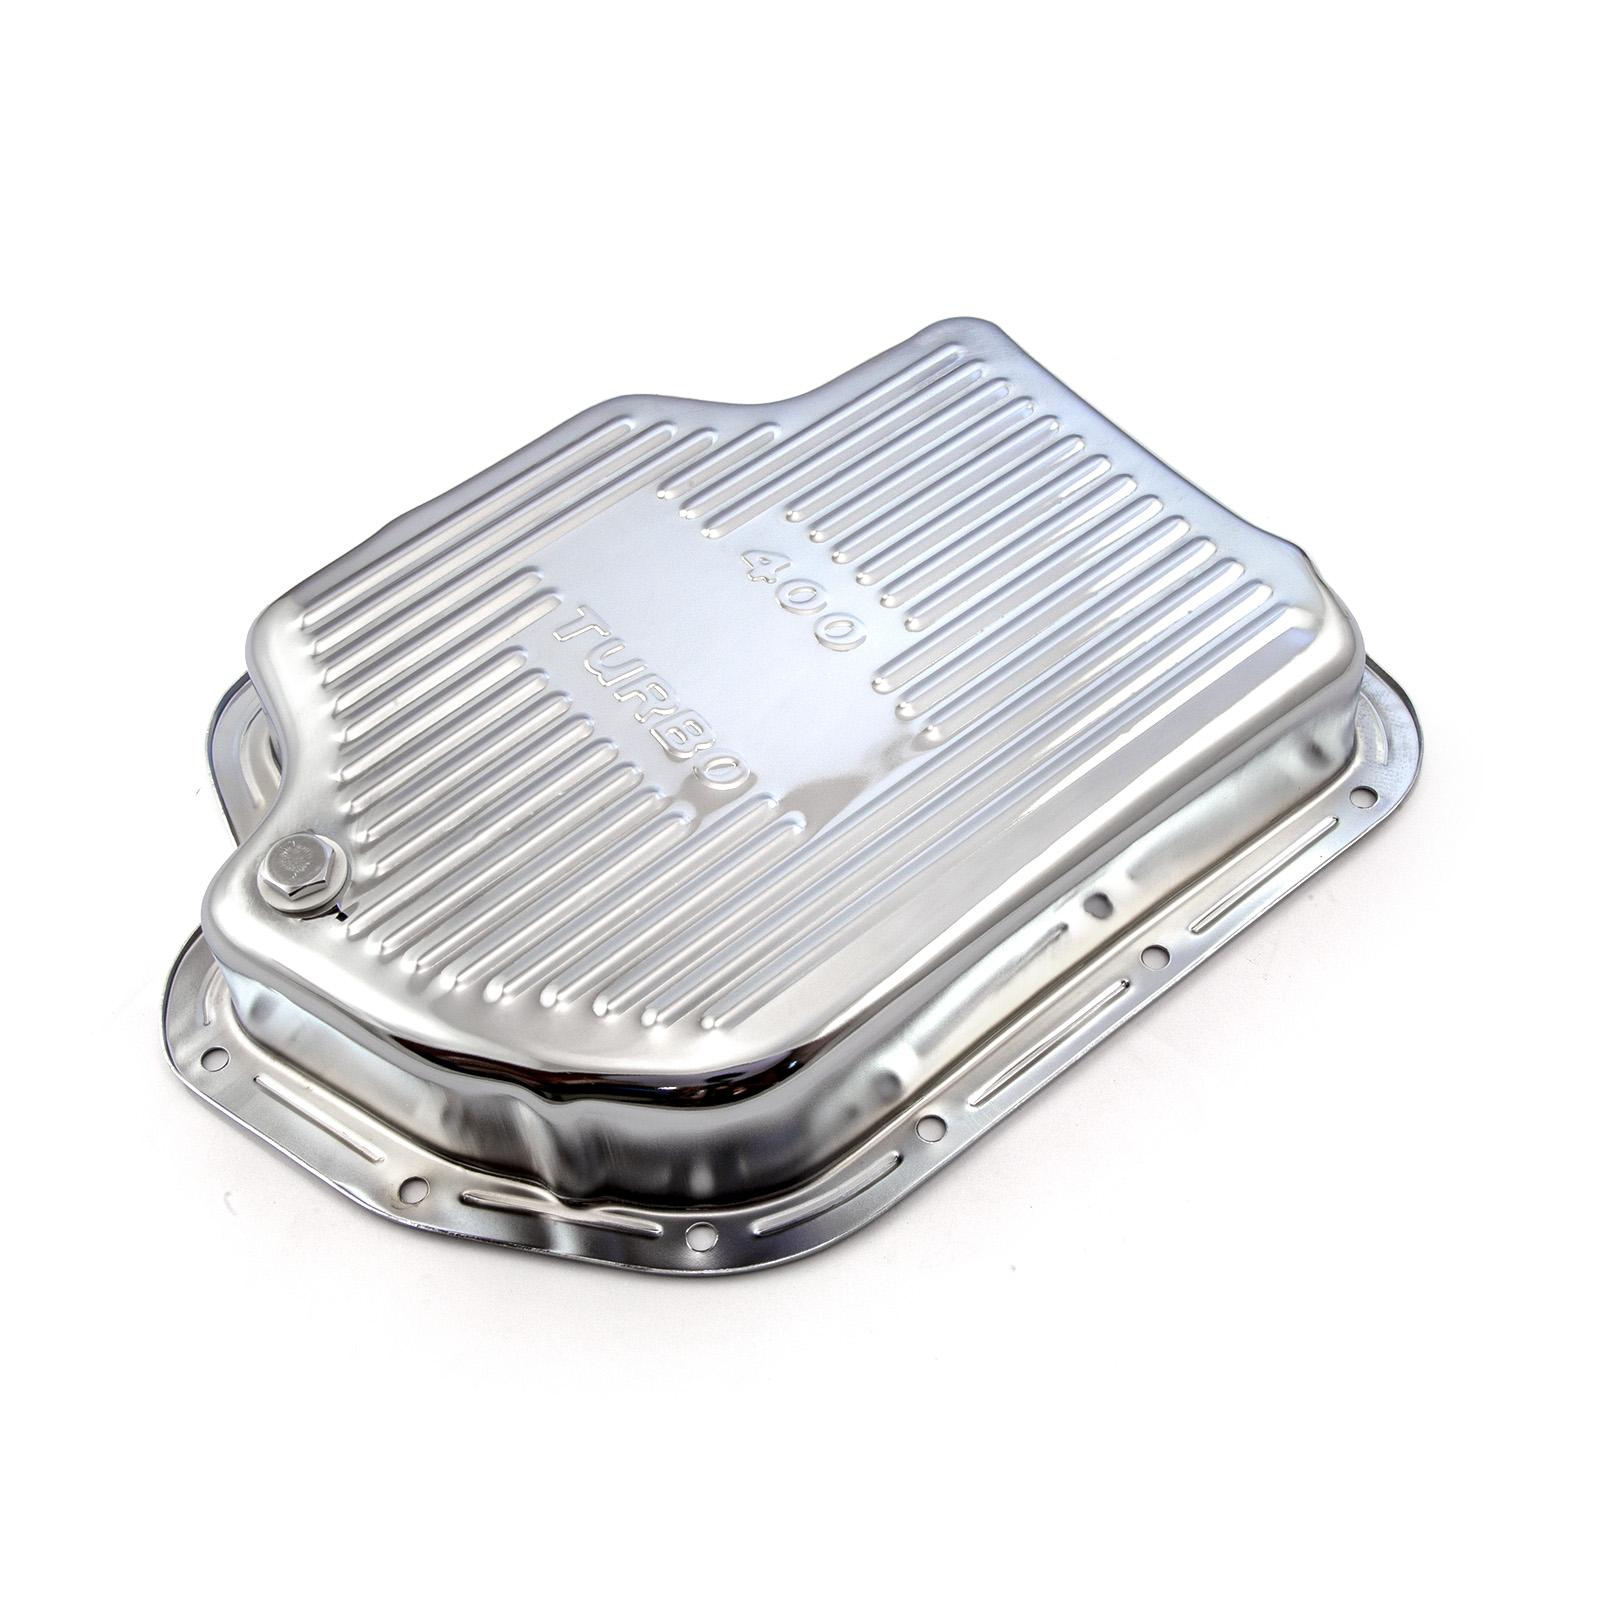 Turbo TH400 Deep Transmission Oil Pan Chrome